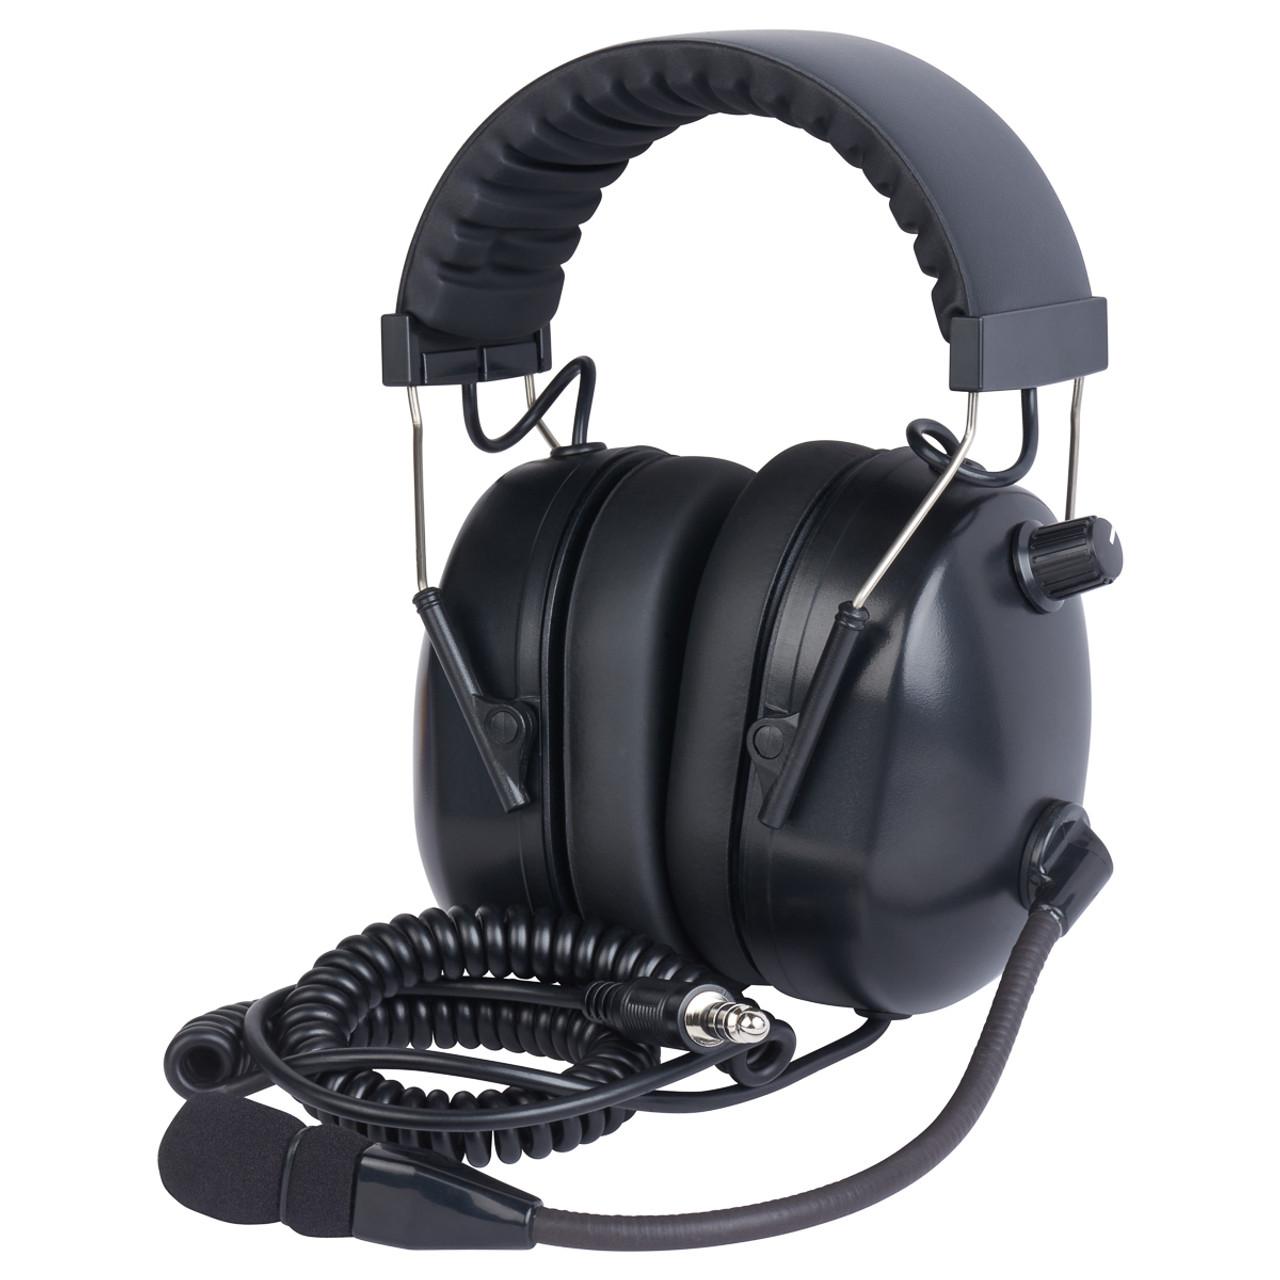 WICOM PNR Helicopter Headset - Black